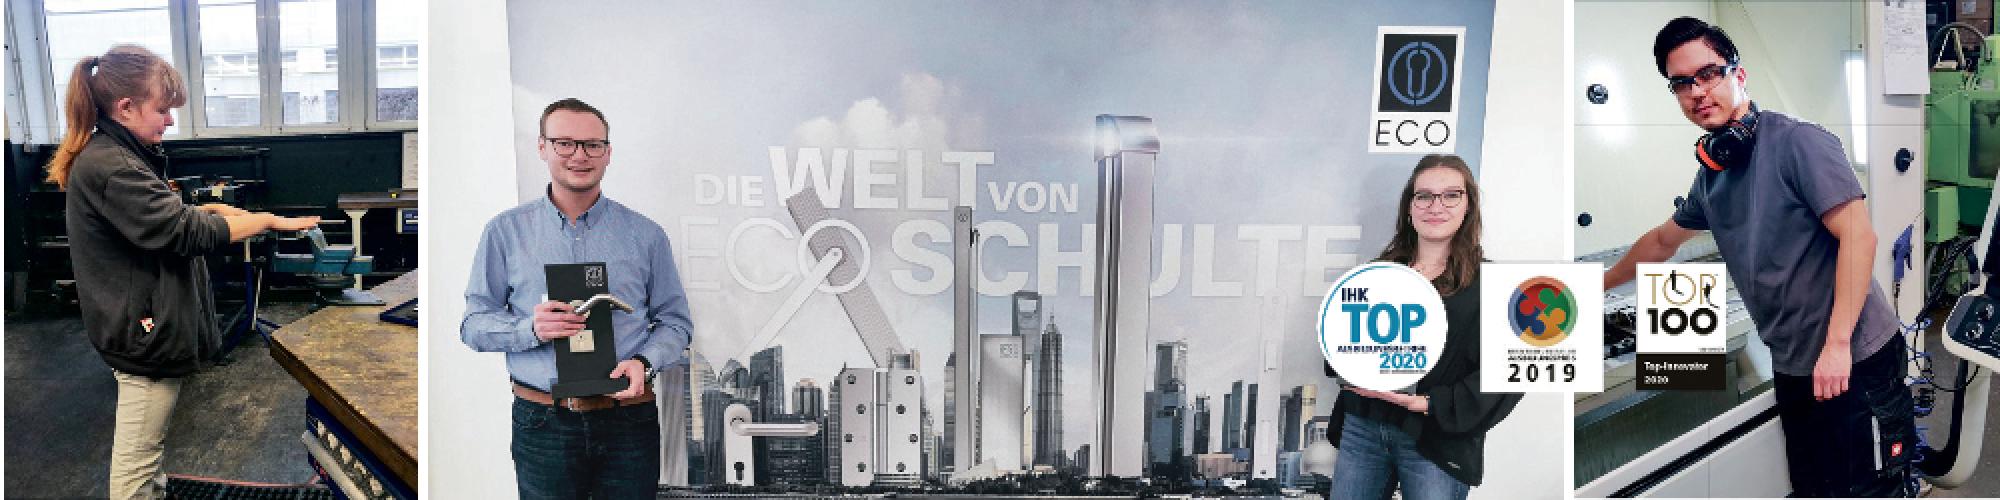 ESB Schulte GmbH & Co. KG